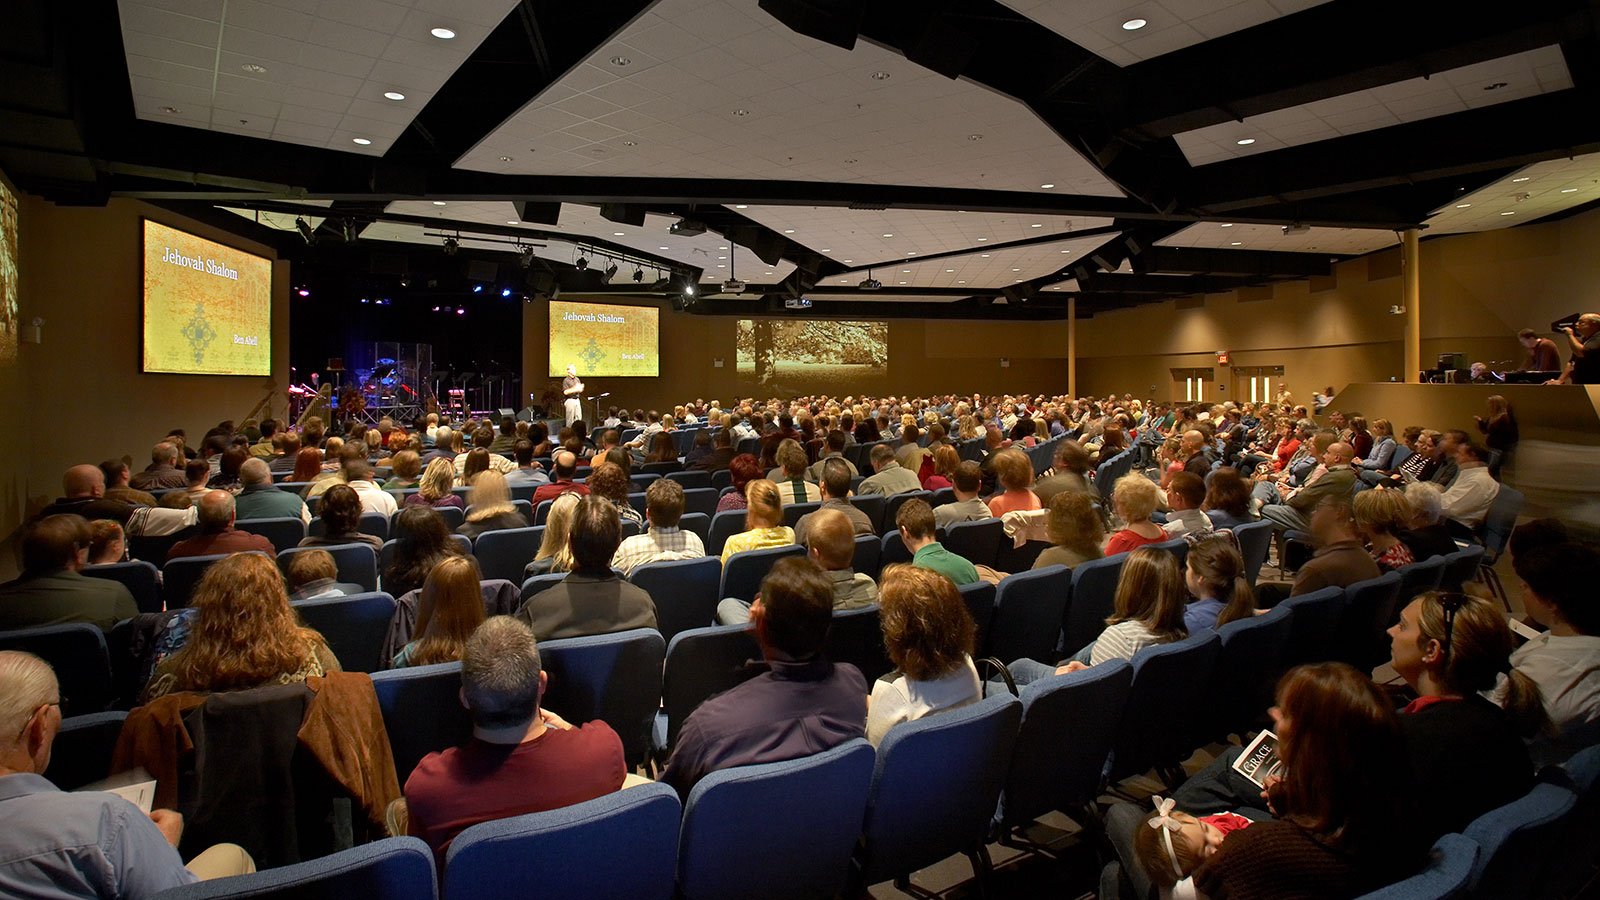 Grace-Fellowship-Church---Phase-1-Auditorium-02.jpg